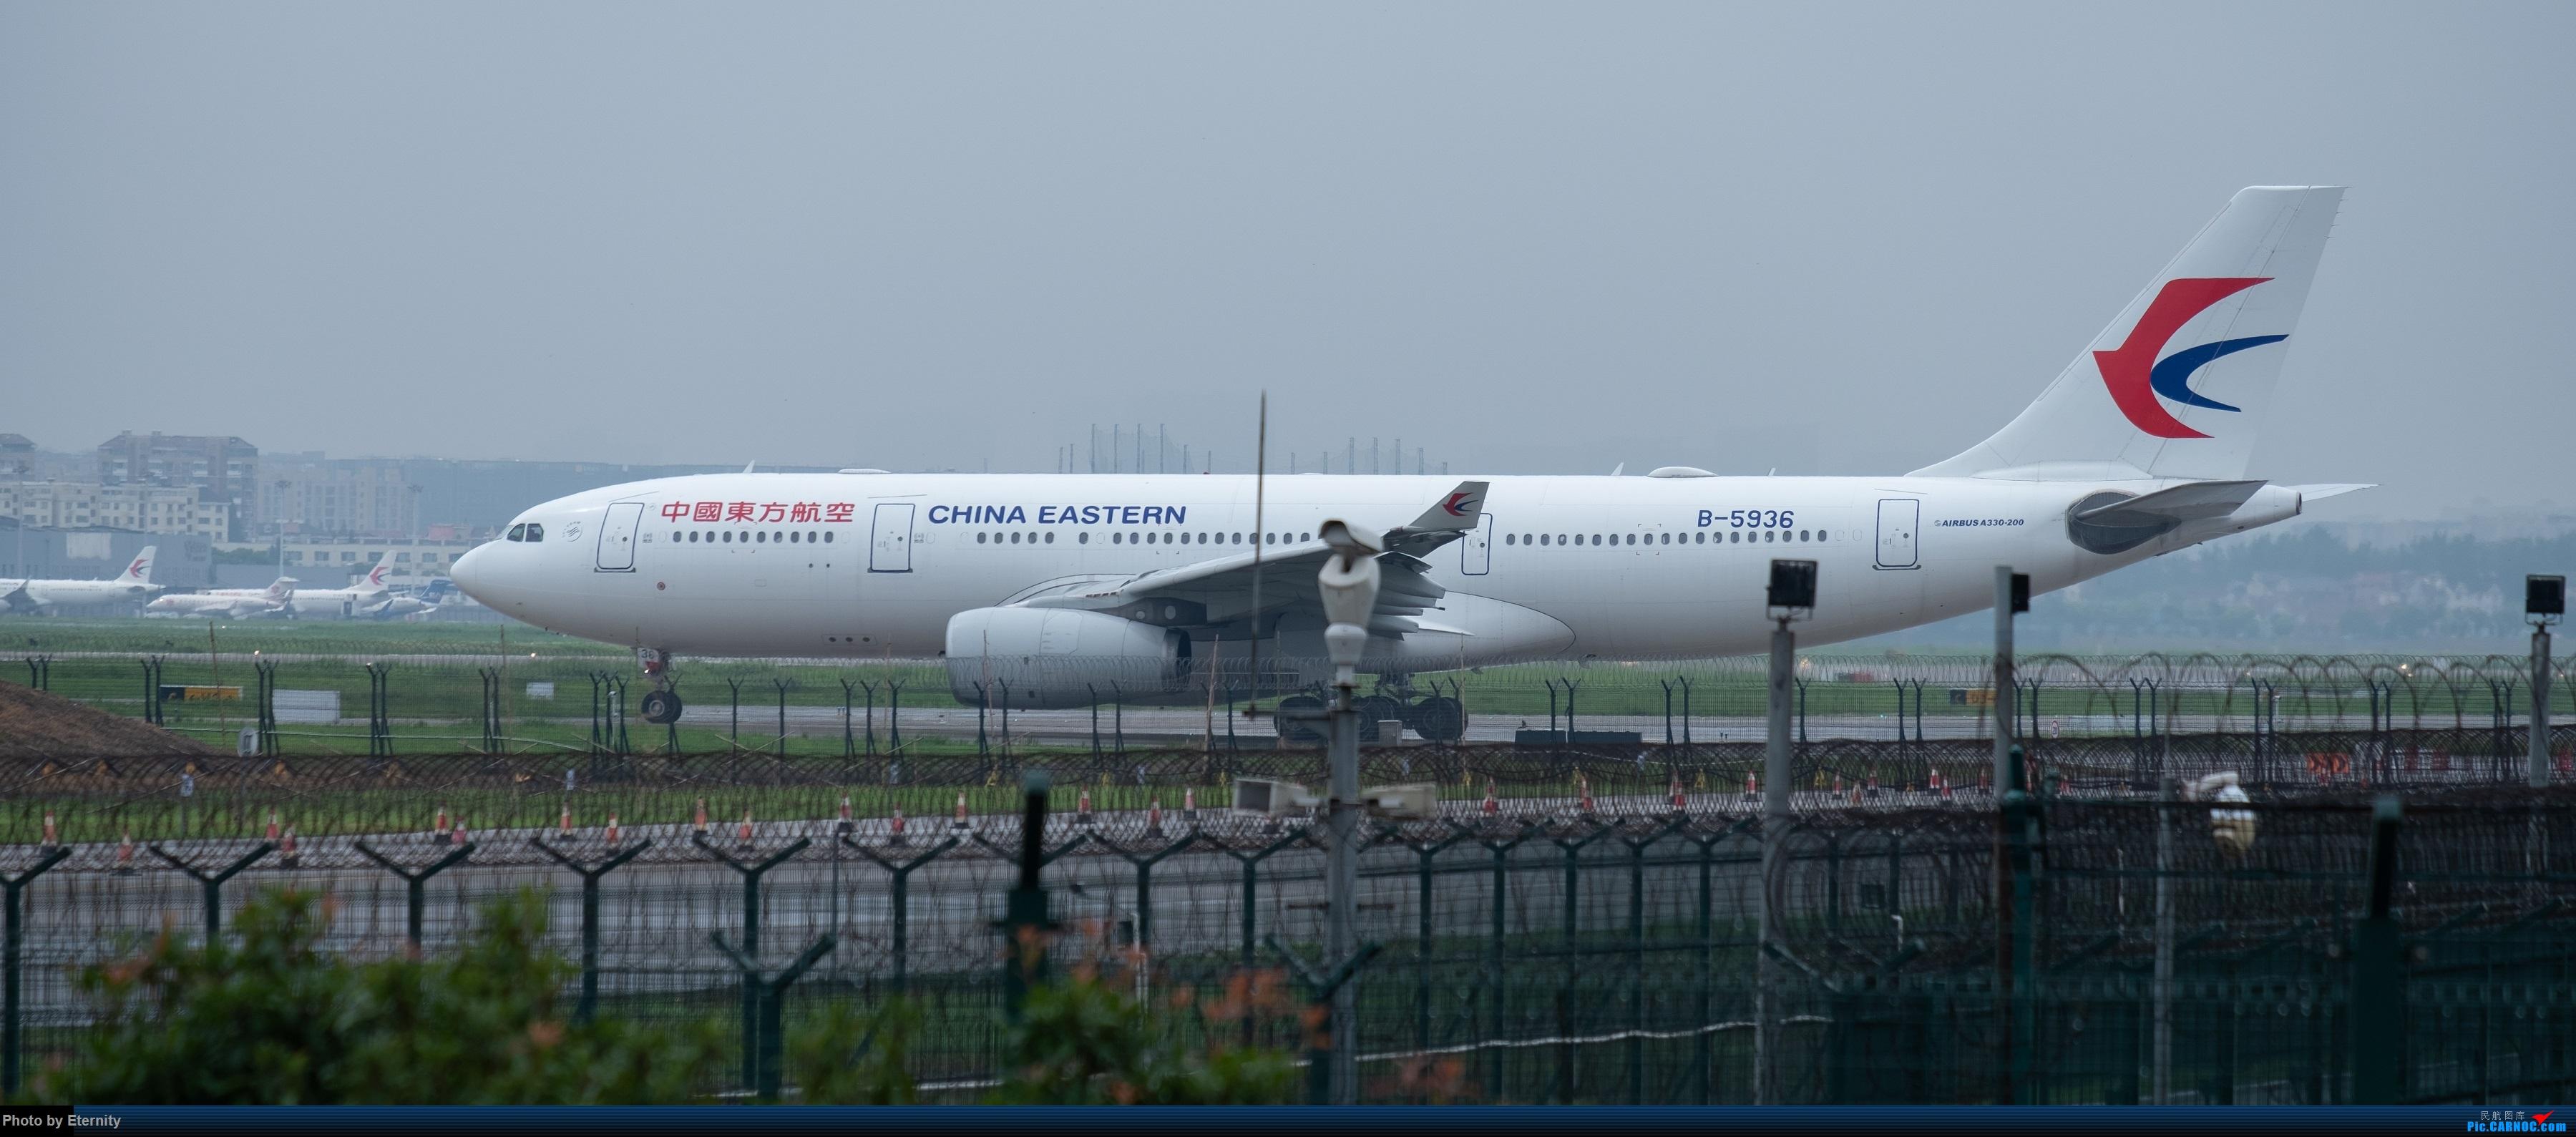 Re:[原创]后疫情期间的暑假国内游 | 西安-上海-广州-成都 | 体验国内3条干线 | 吉祥航空787 | 南航350 | 海航737 AIRBUS A330-200 B-5936 中国上海虹桥国际机场